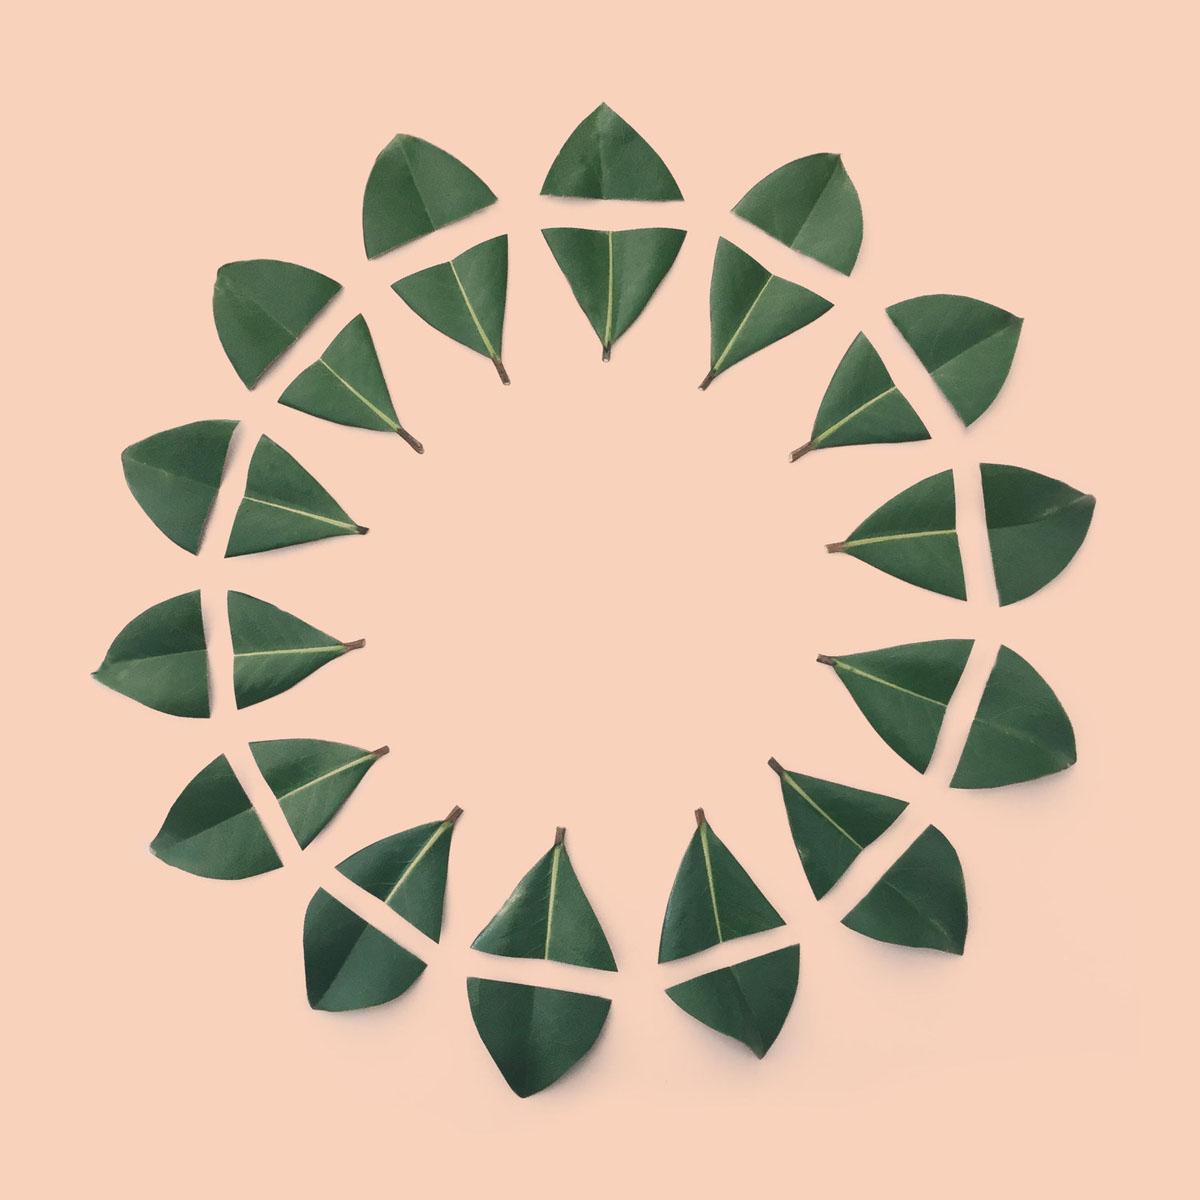 circle+of+magnolia+leavess